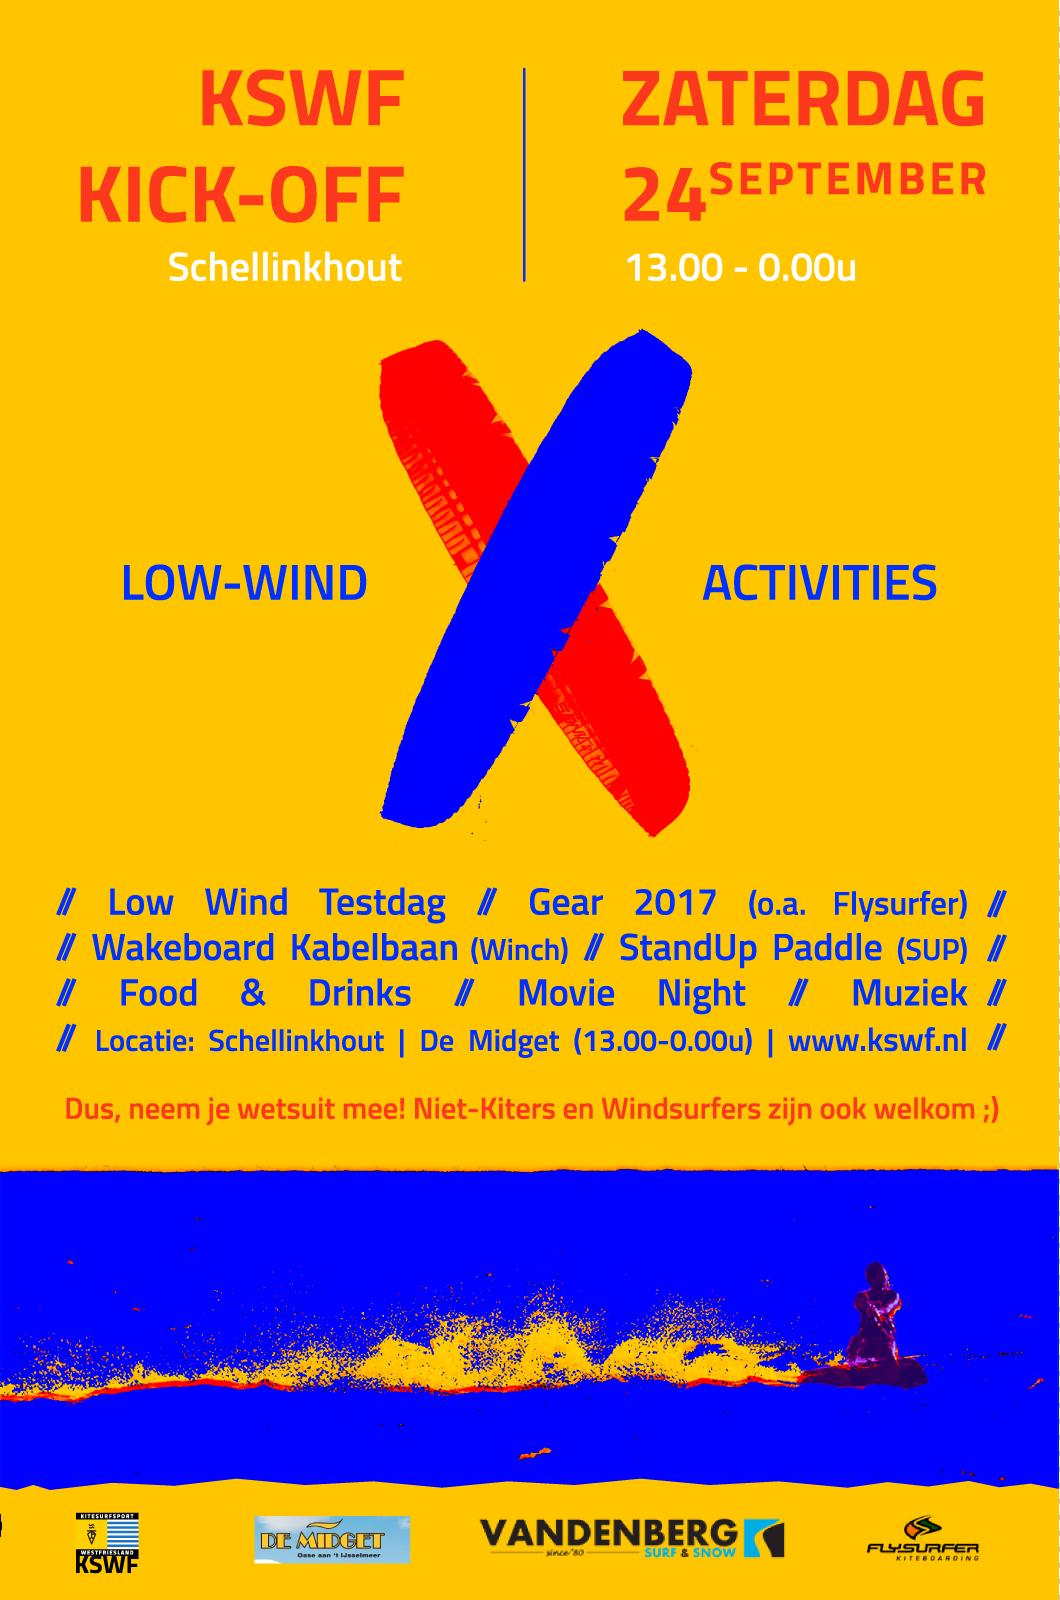 kswf_kickoff_flyer_24-09-2016